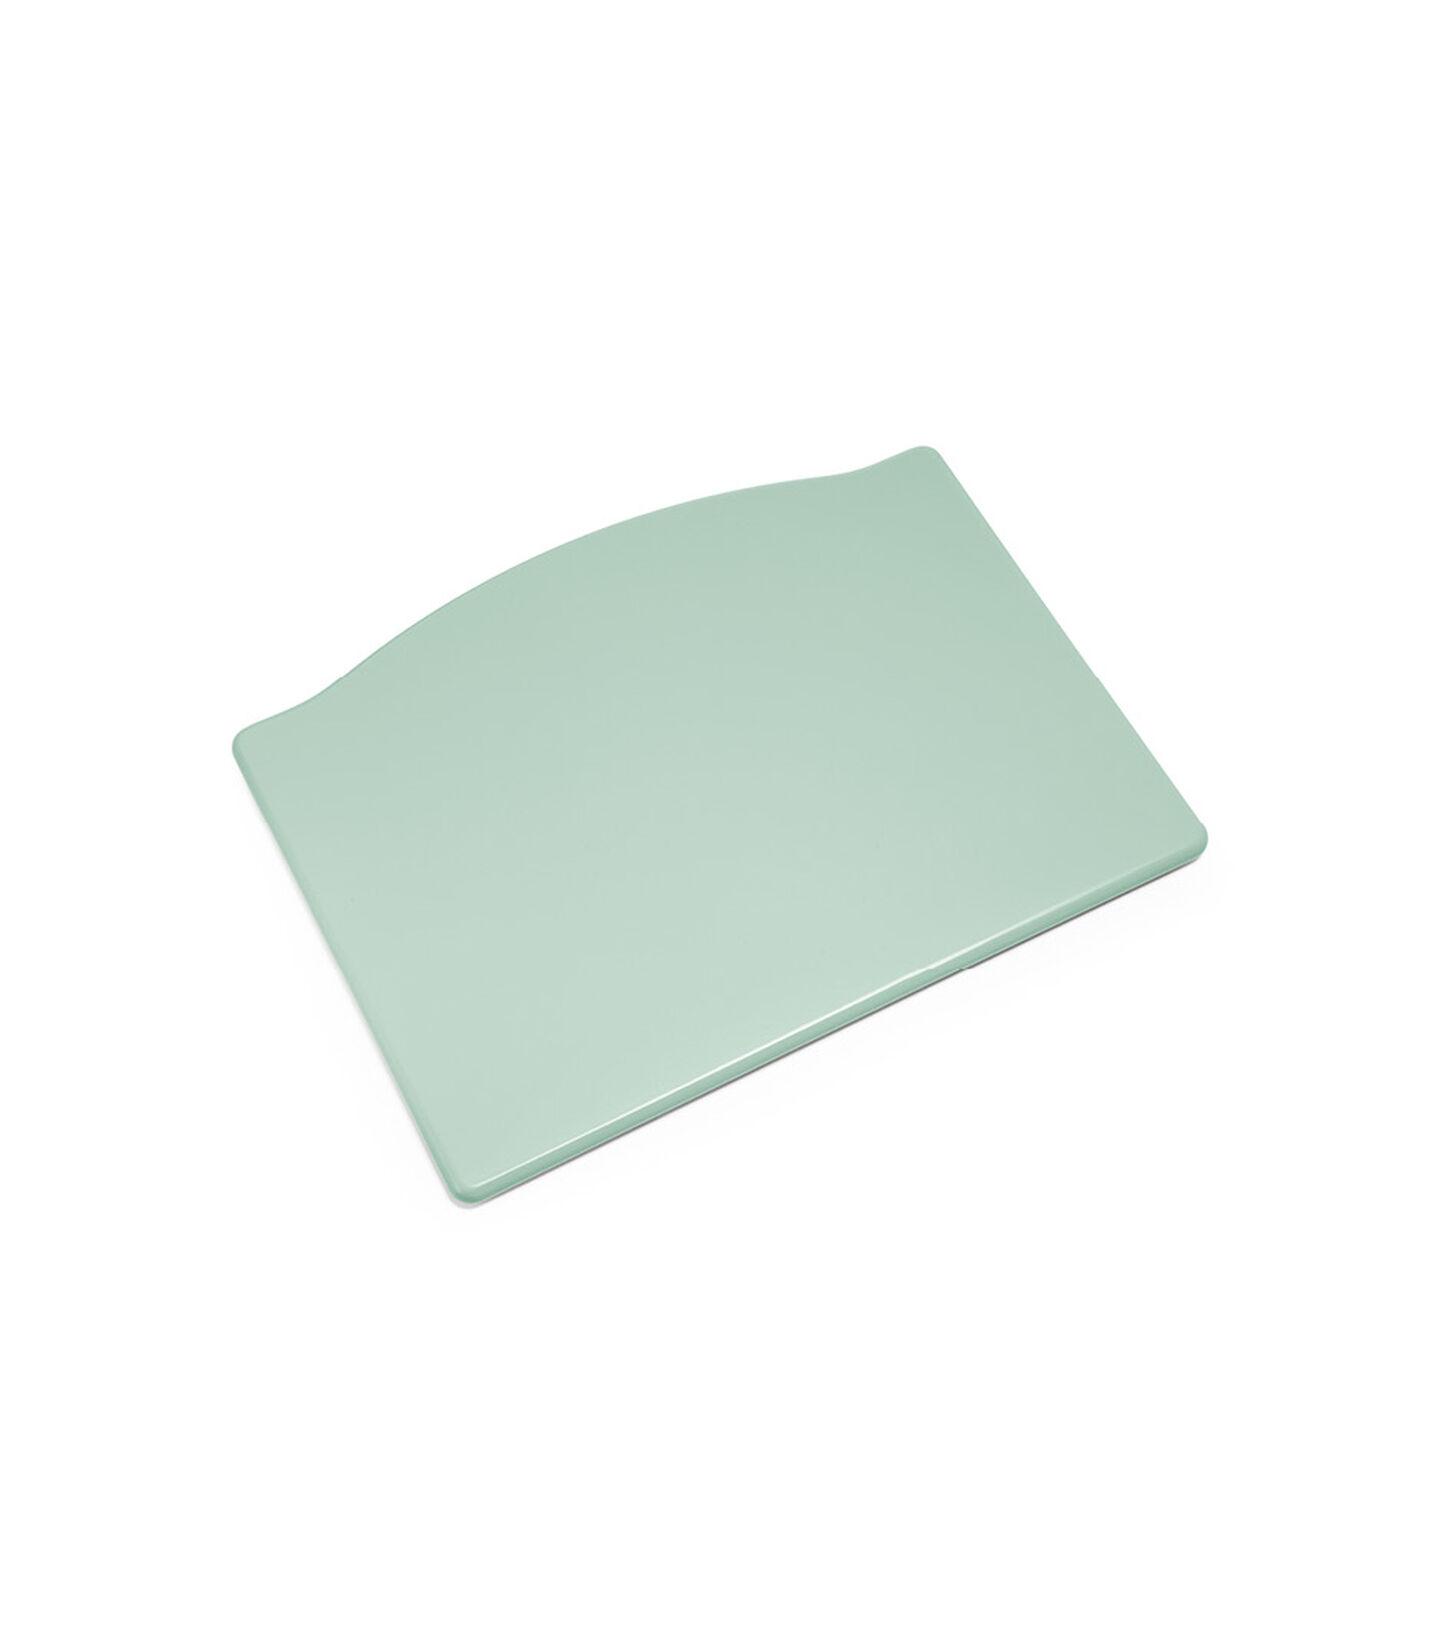 Tripp Trapp® fotplate Soft Mint, Soft Mint, mainview view 1